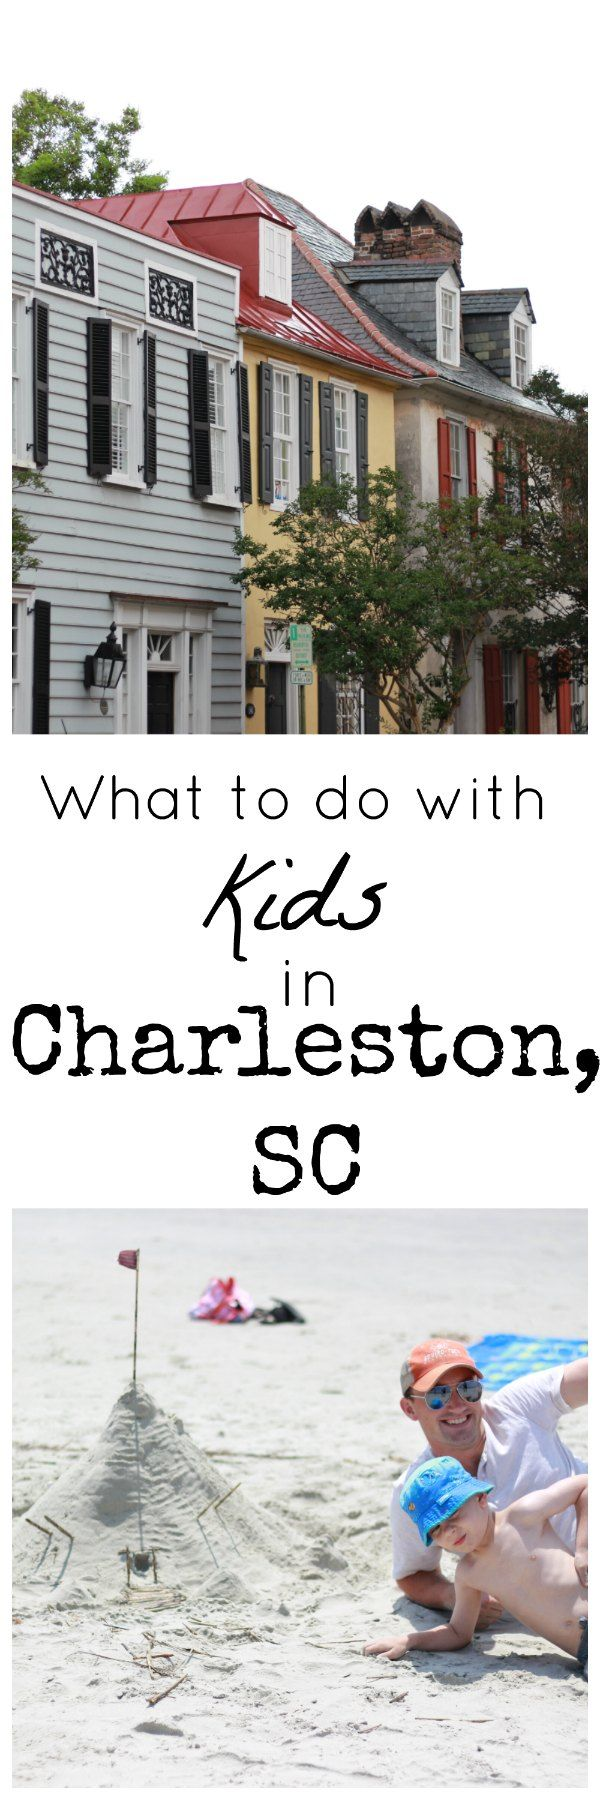 Fun things to do in Charleston South Carolina with Kids